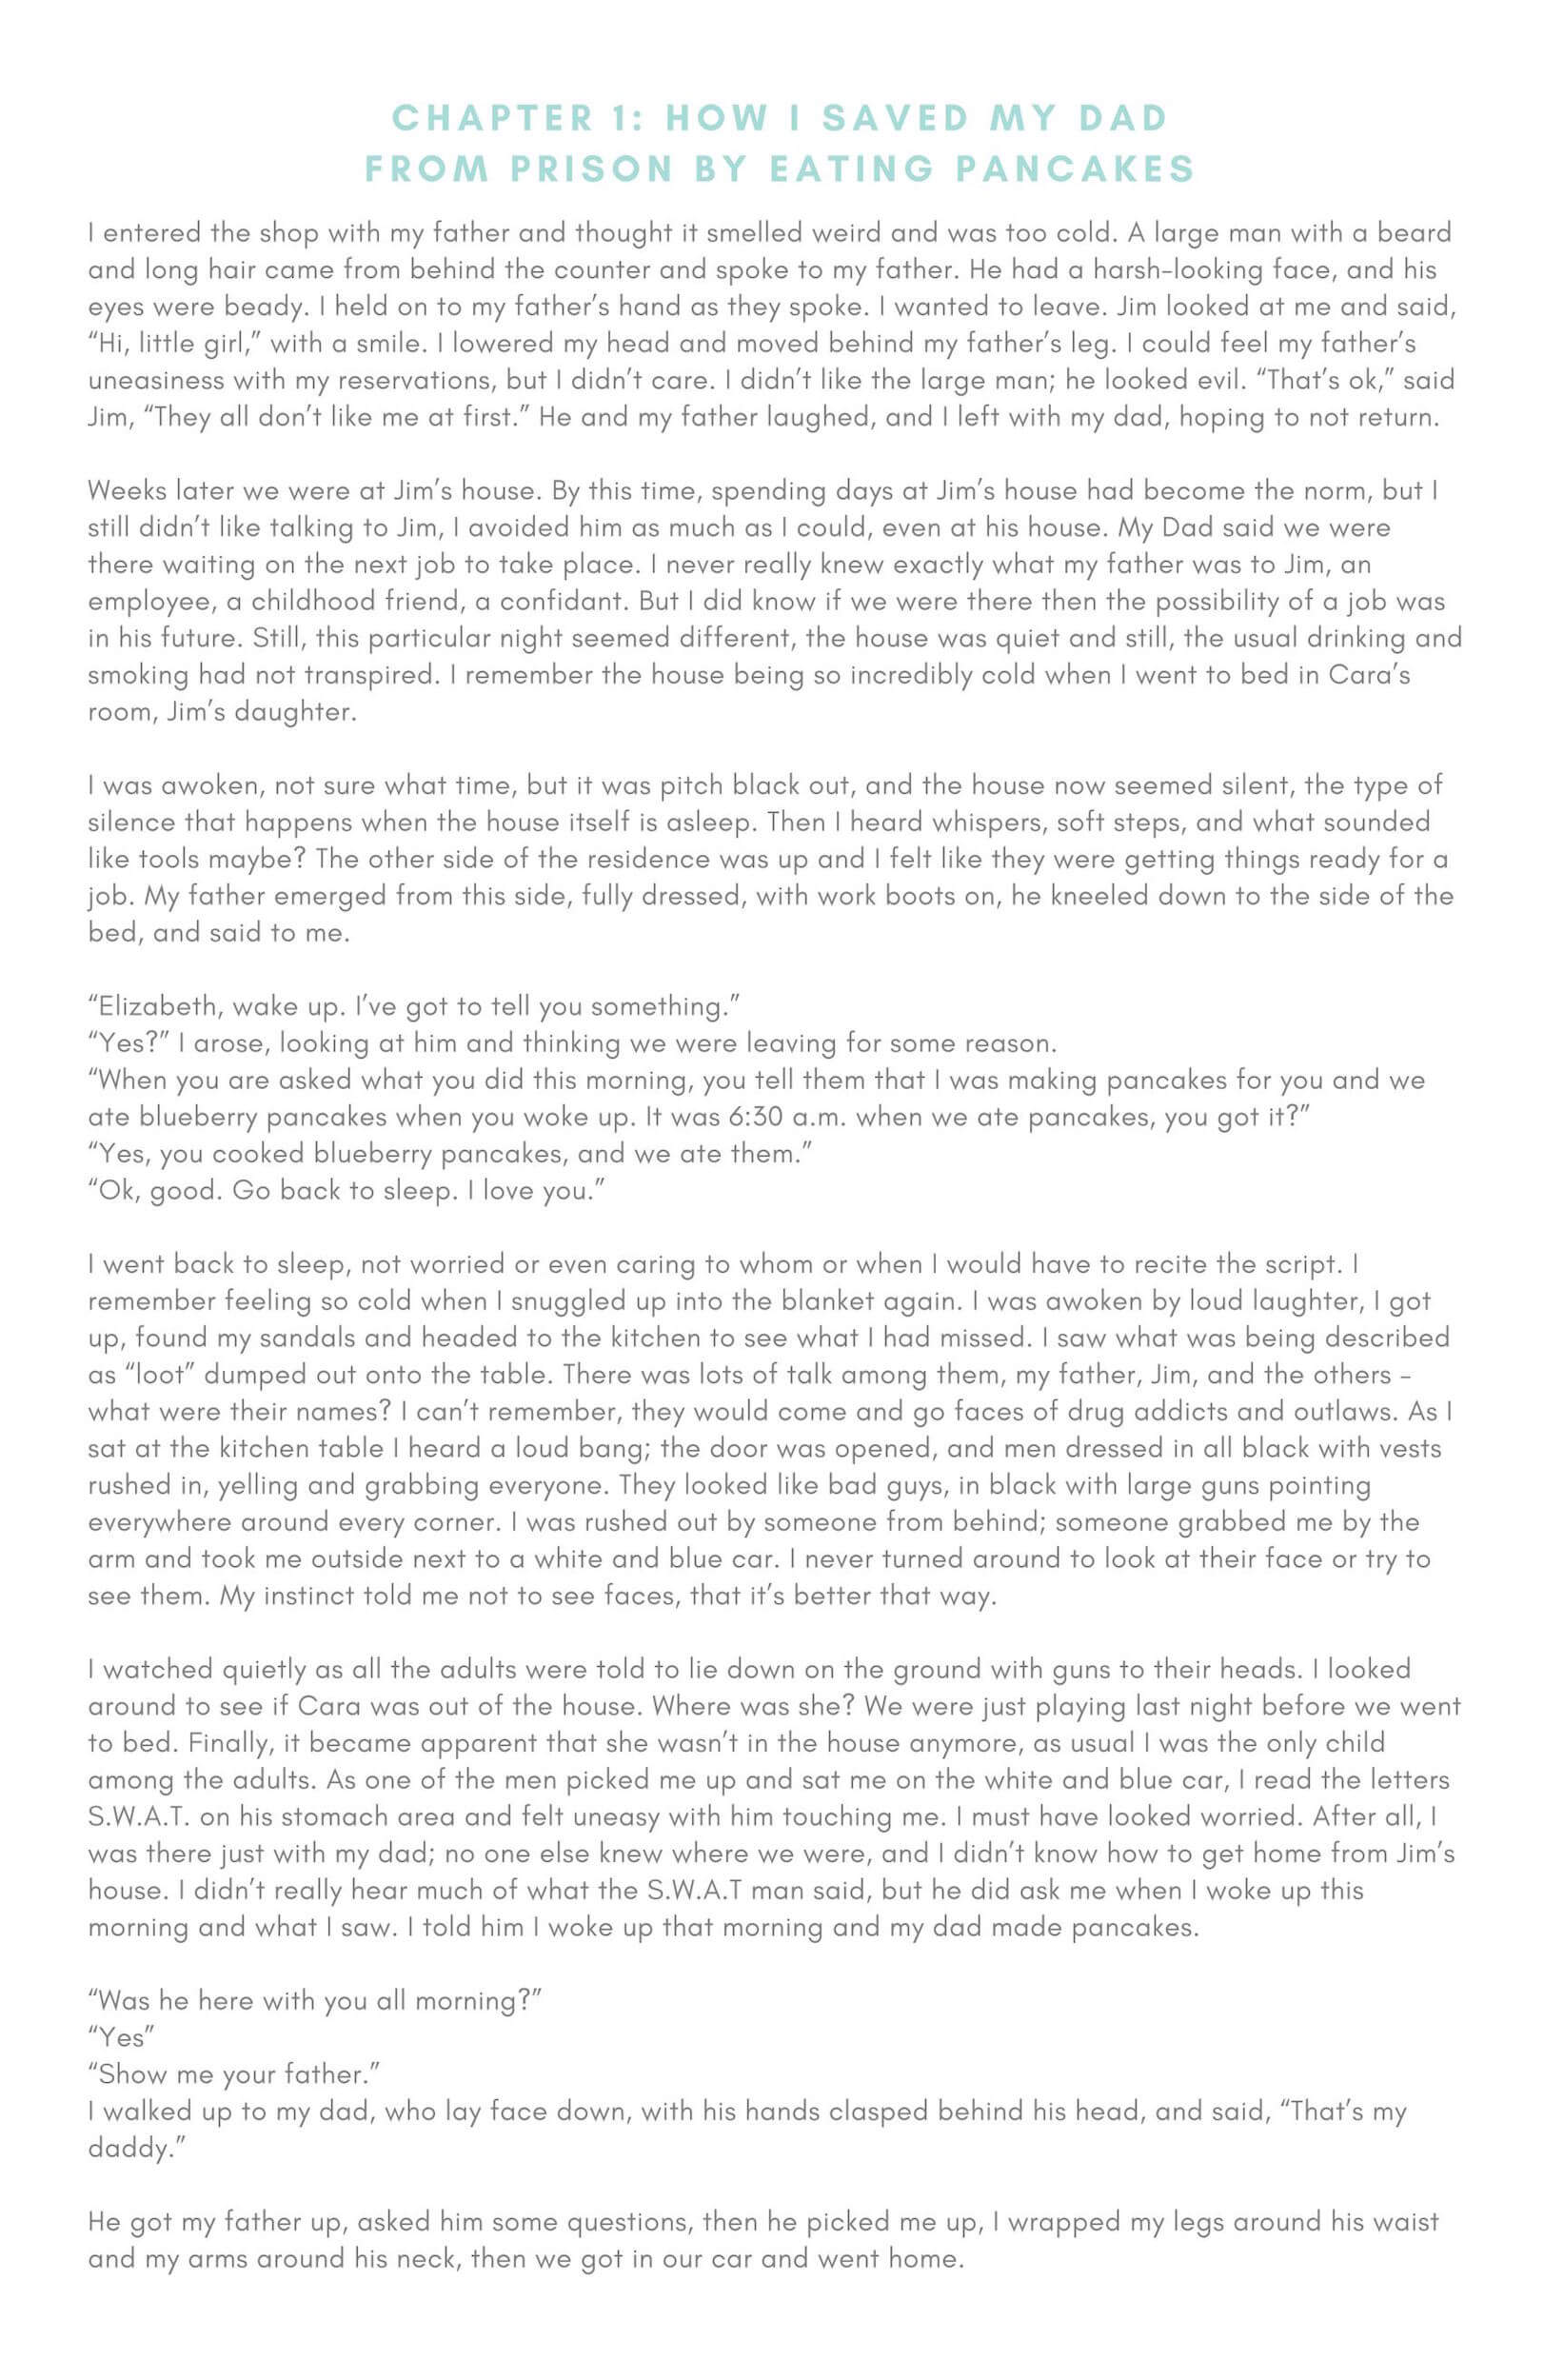 christina-reddick-book-promo-pamphlet-awake-web-design-01.jpg